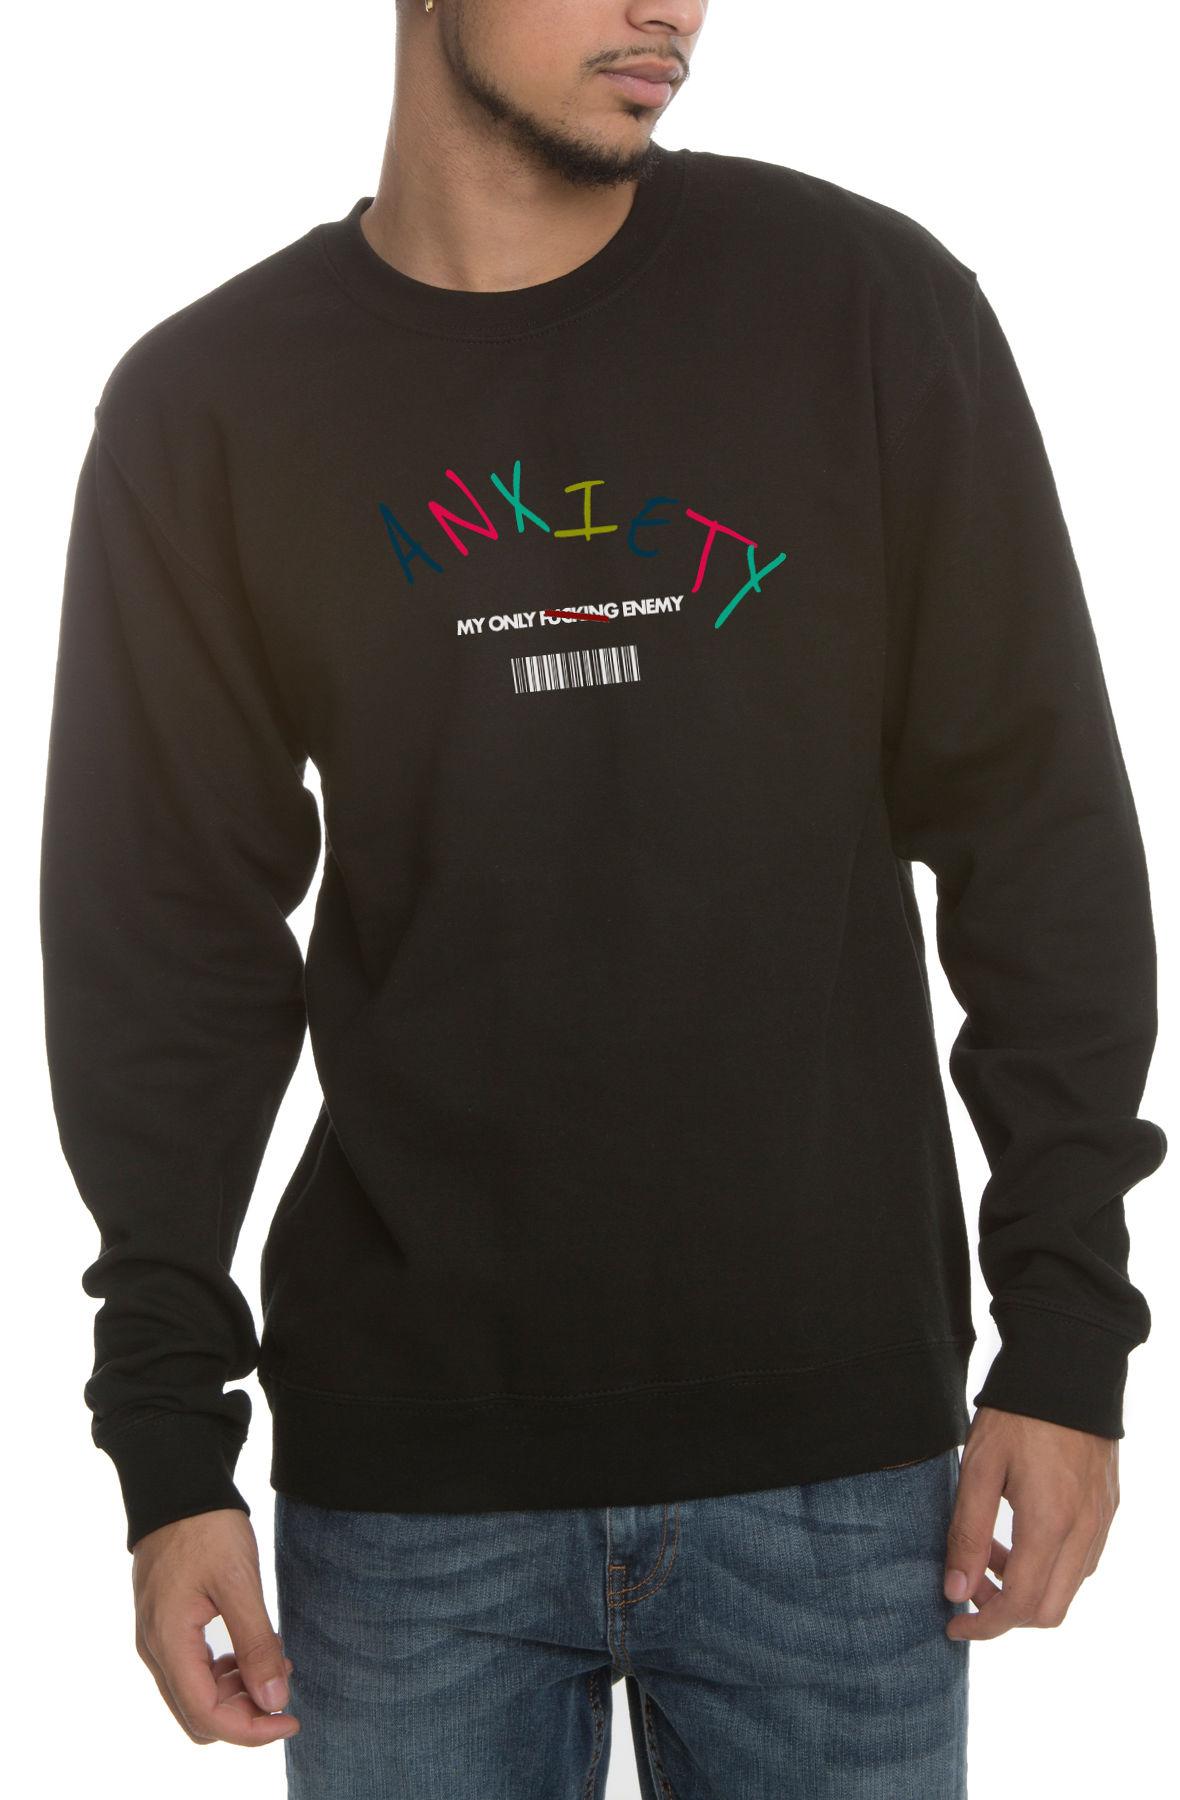 The My Only Enemy Crewneck Sweatshirt in Black